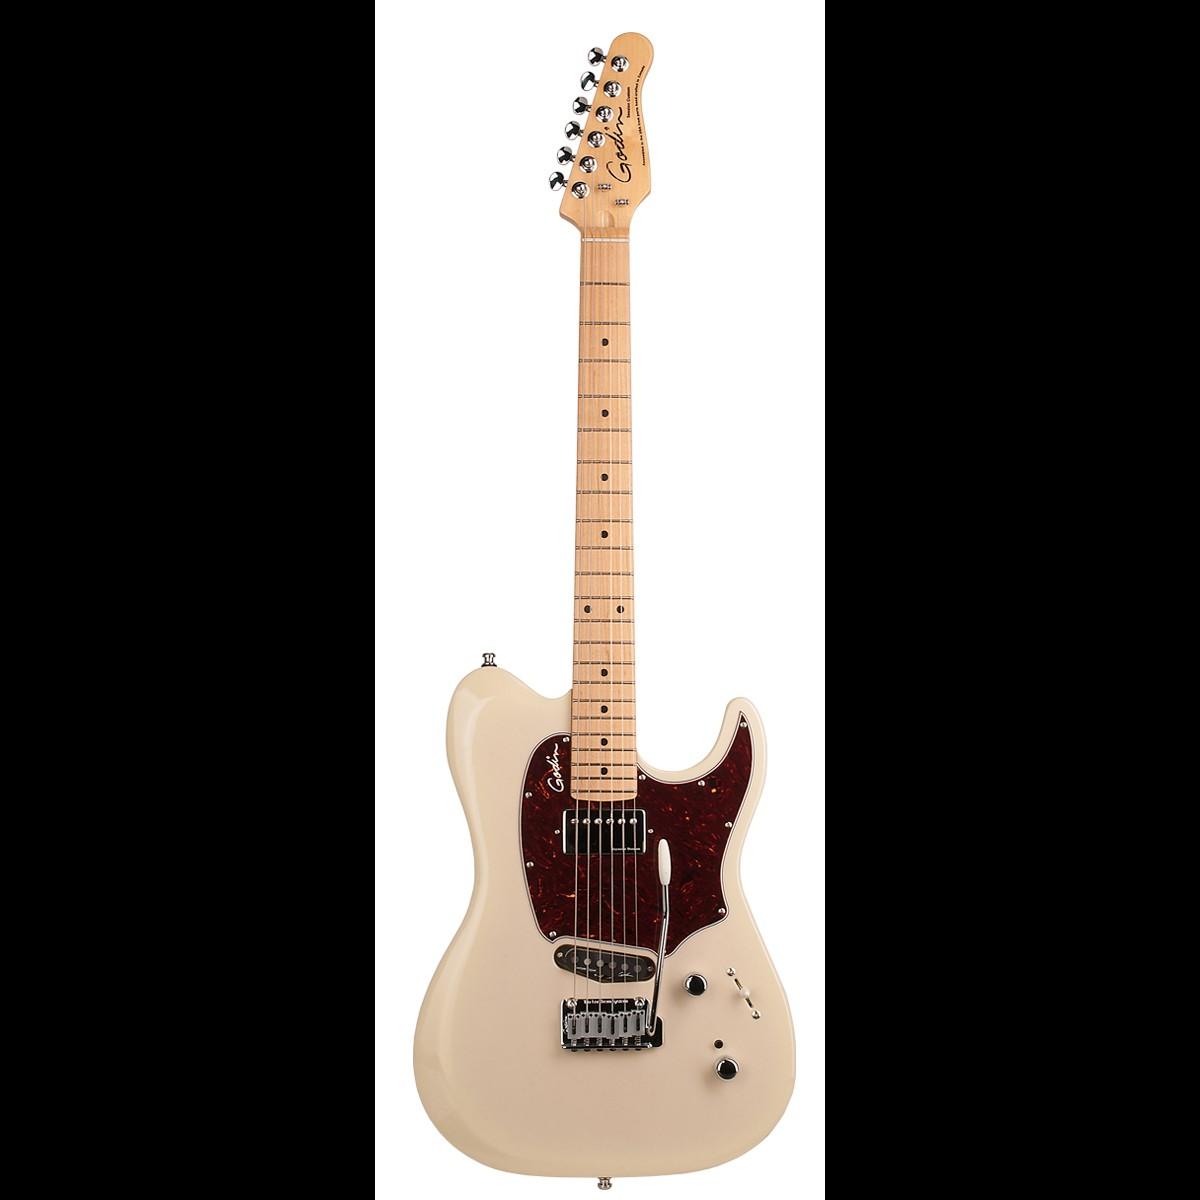 godin session custom 59 hg maple guitar trans cream with gig bag hot rox uk. Black Bedroom Furniture Sets. Home Design Ideas